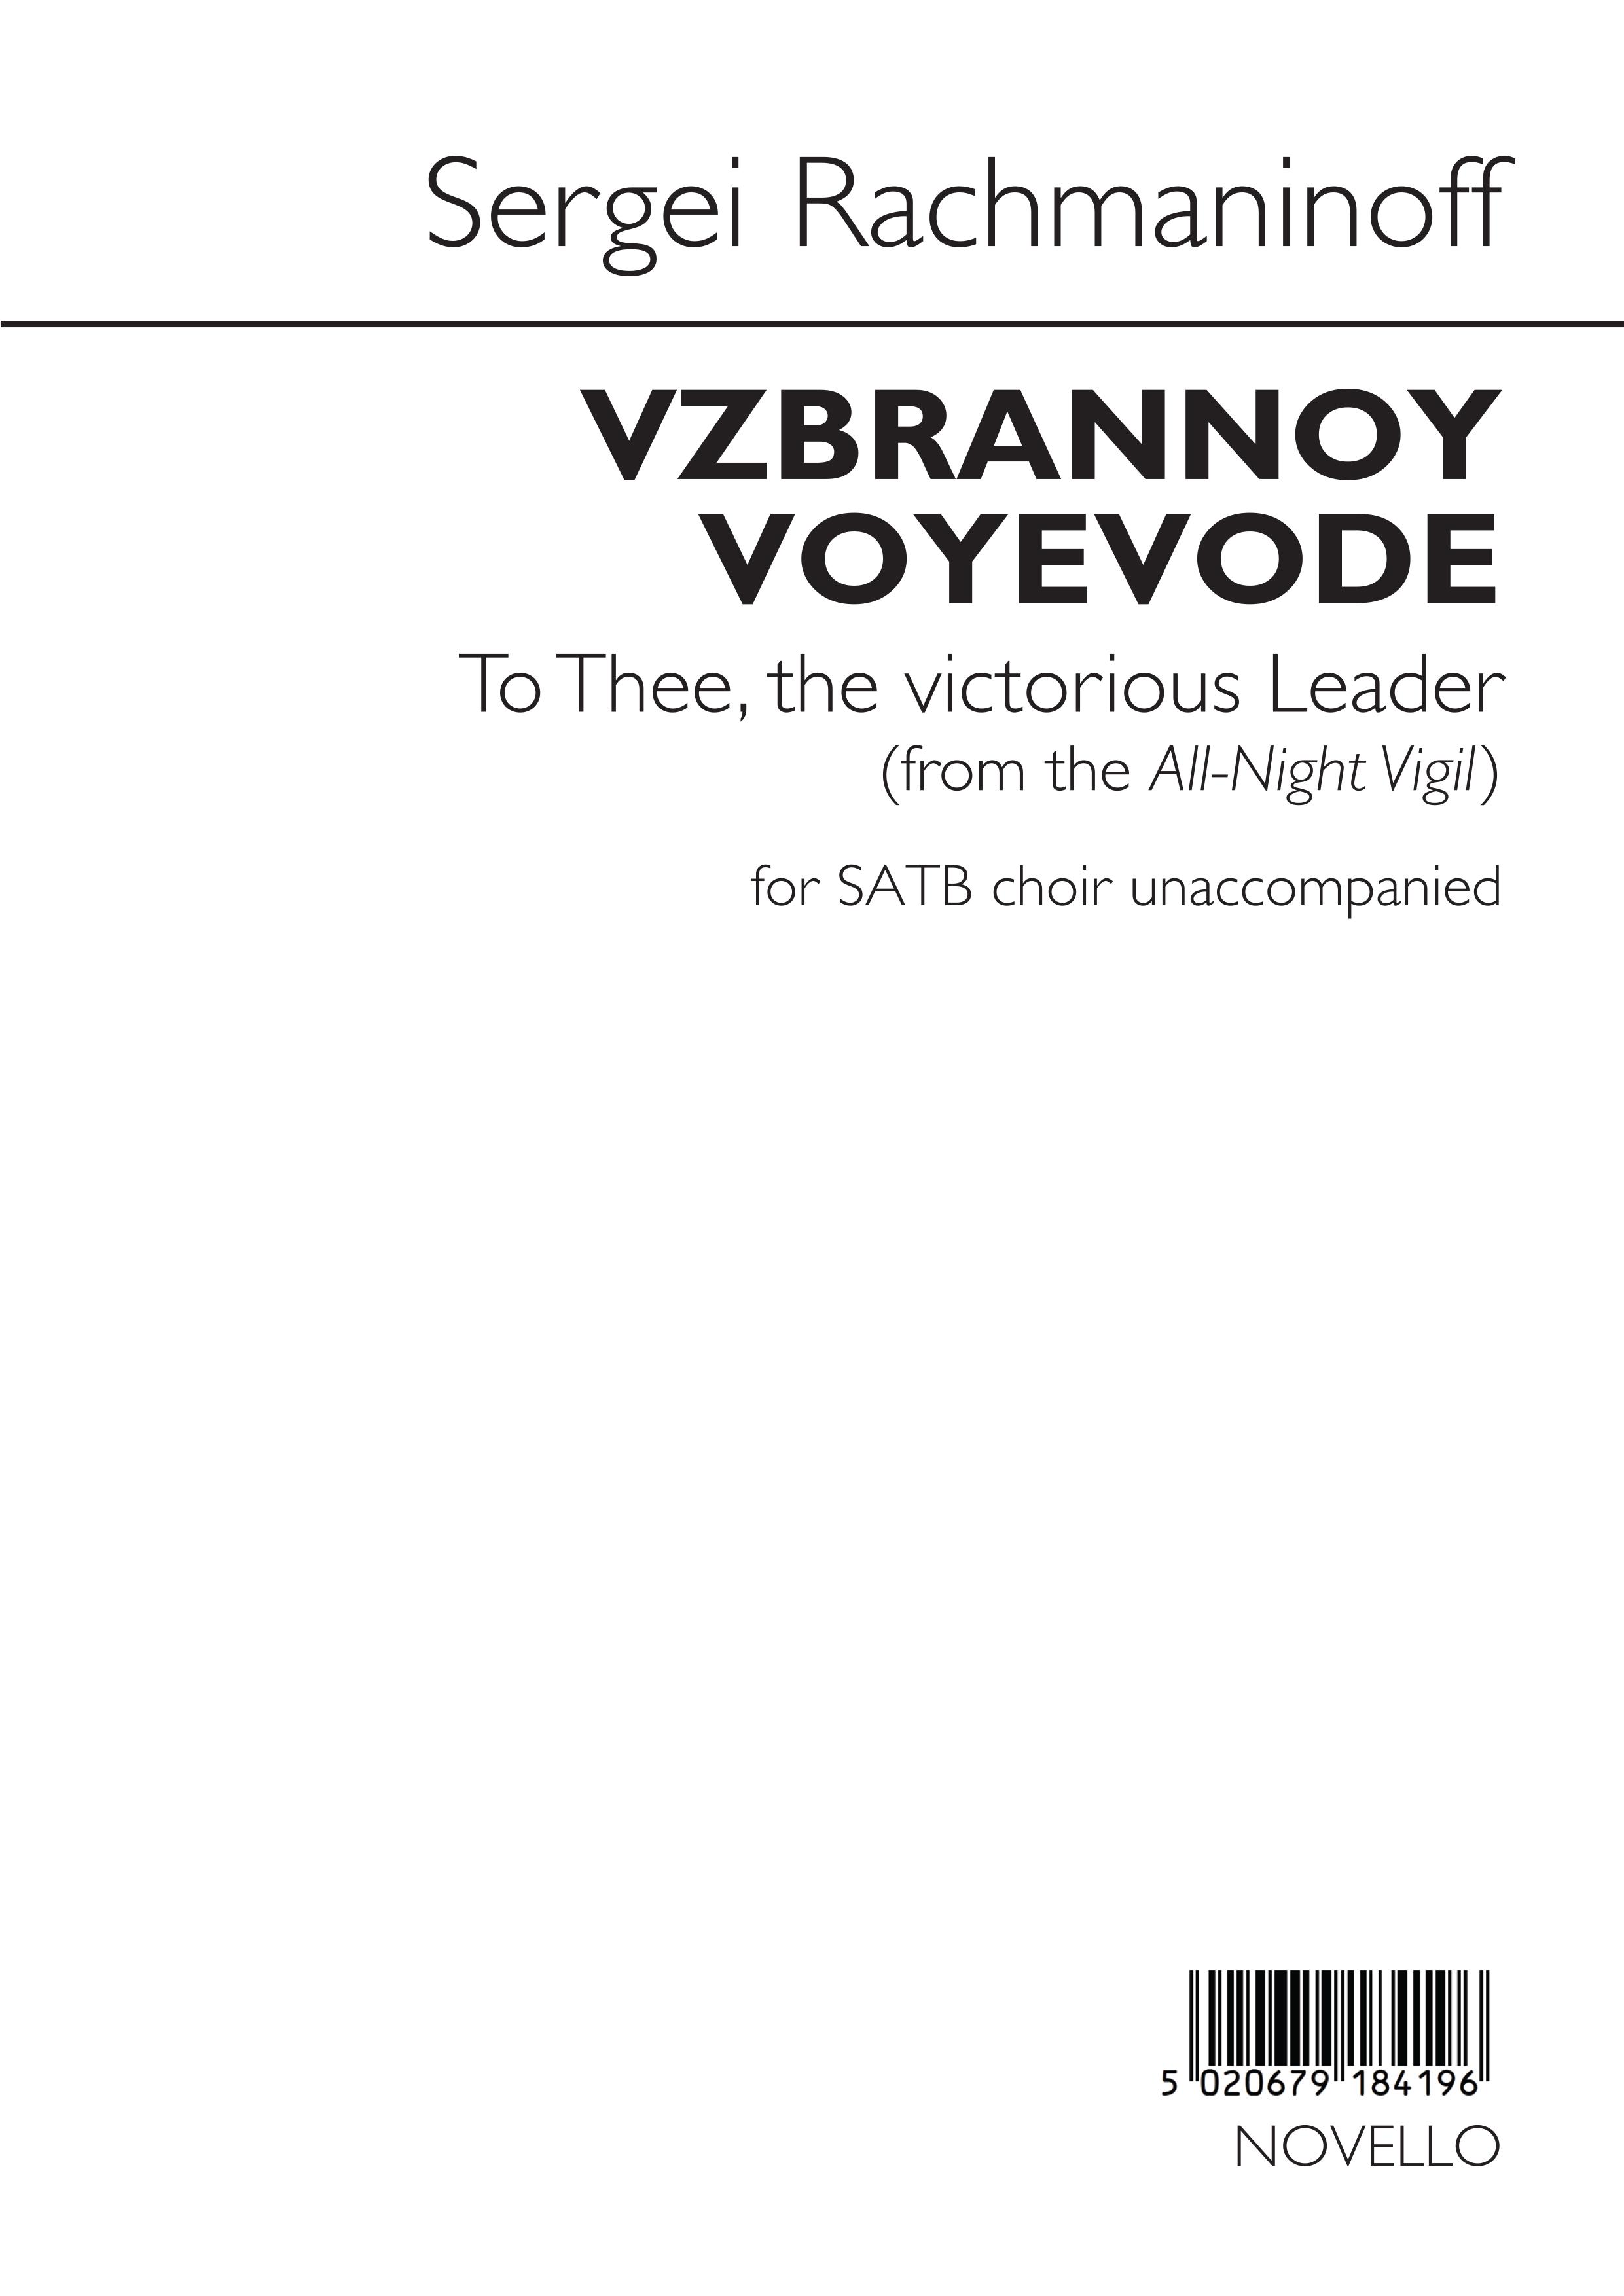 Sergei Rachmaninov: Vzbrannoy Voyevode: SATB: Vocal Score